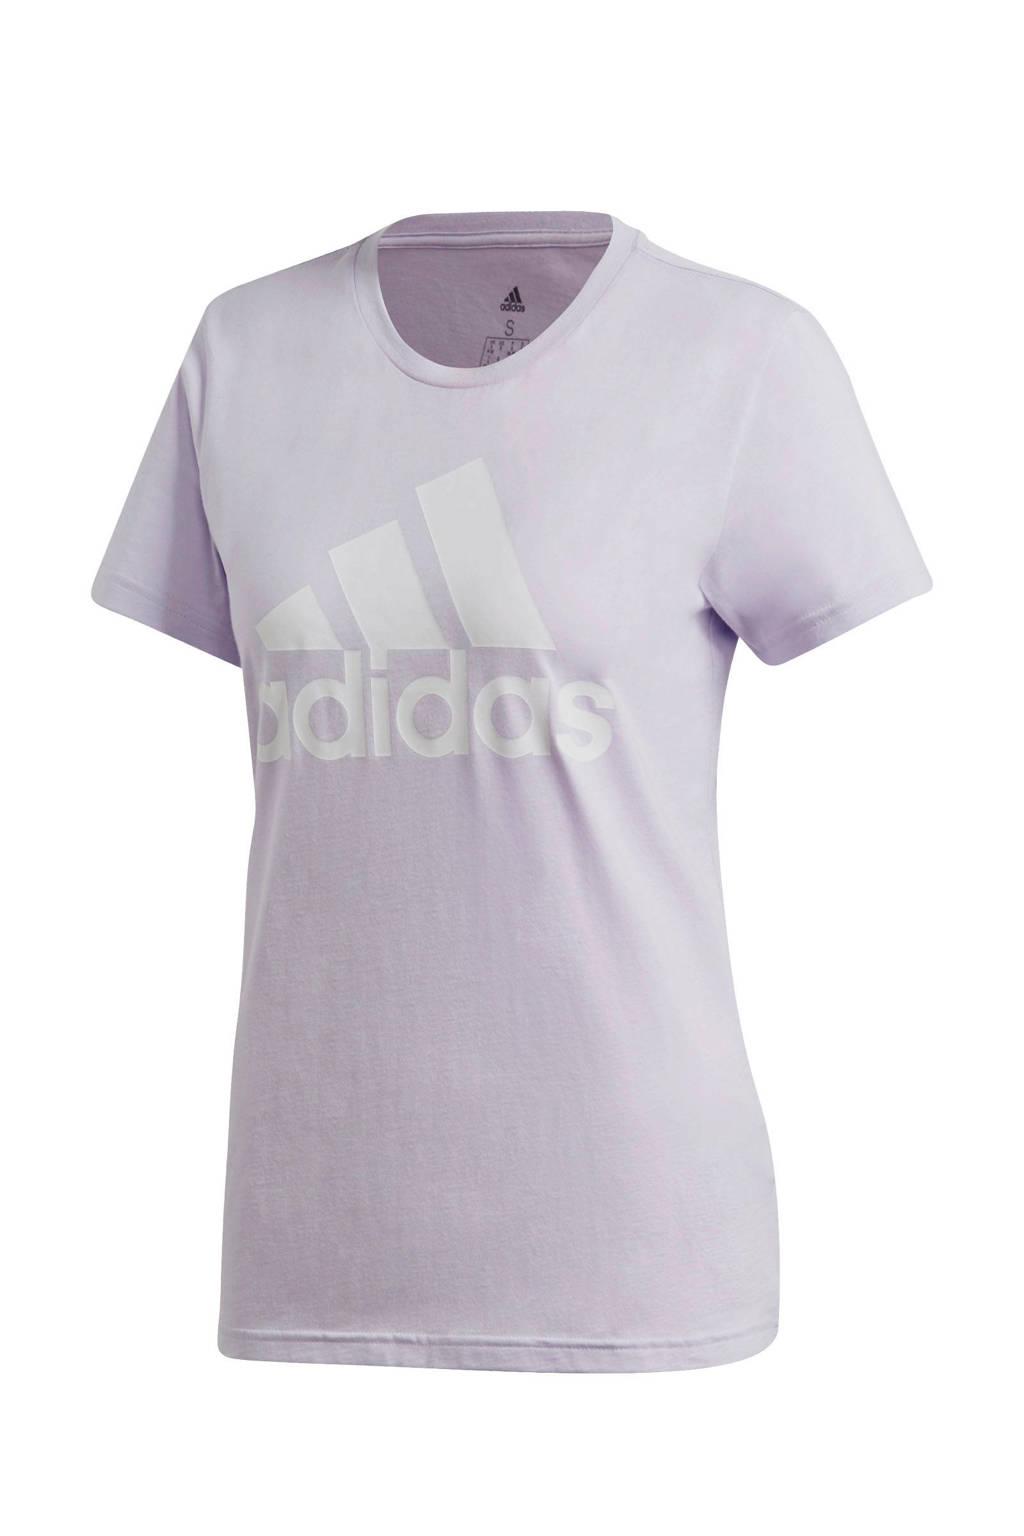 adidas Performance sport T-shirt lila, Lila